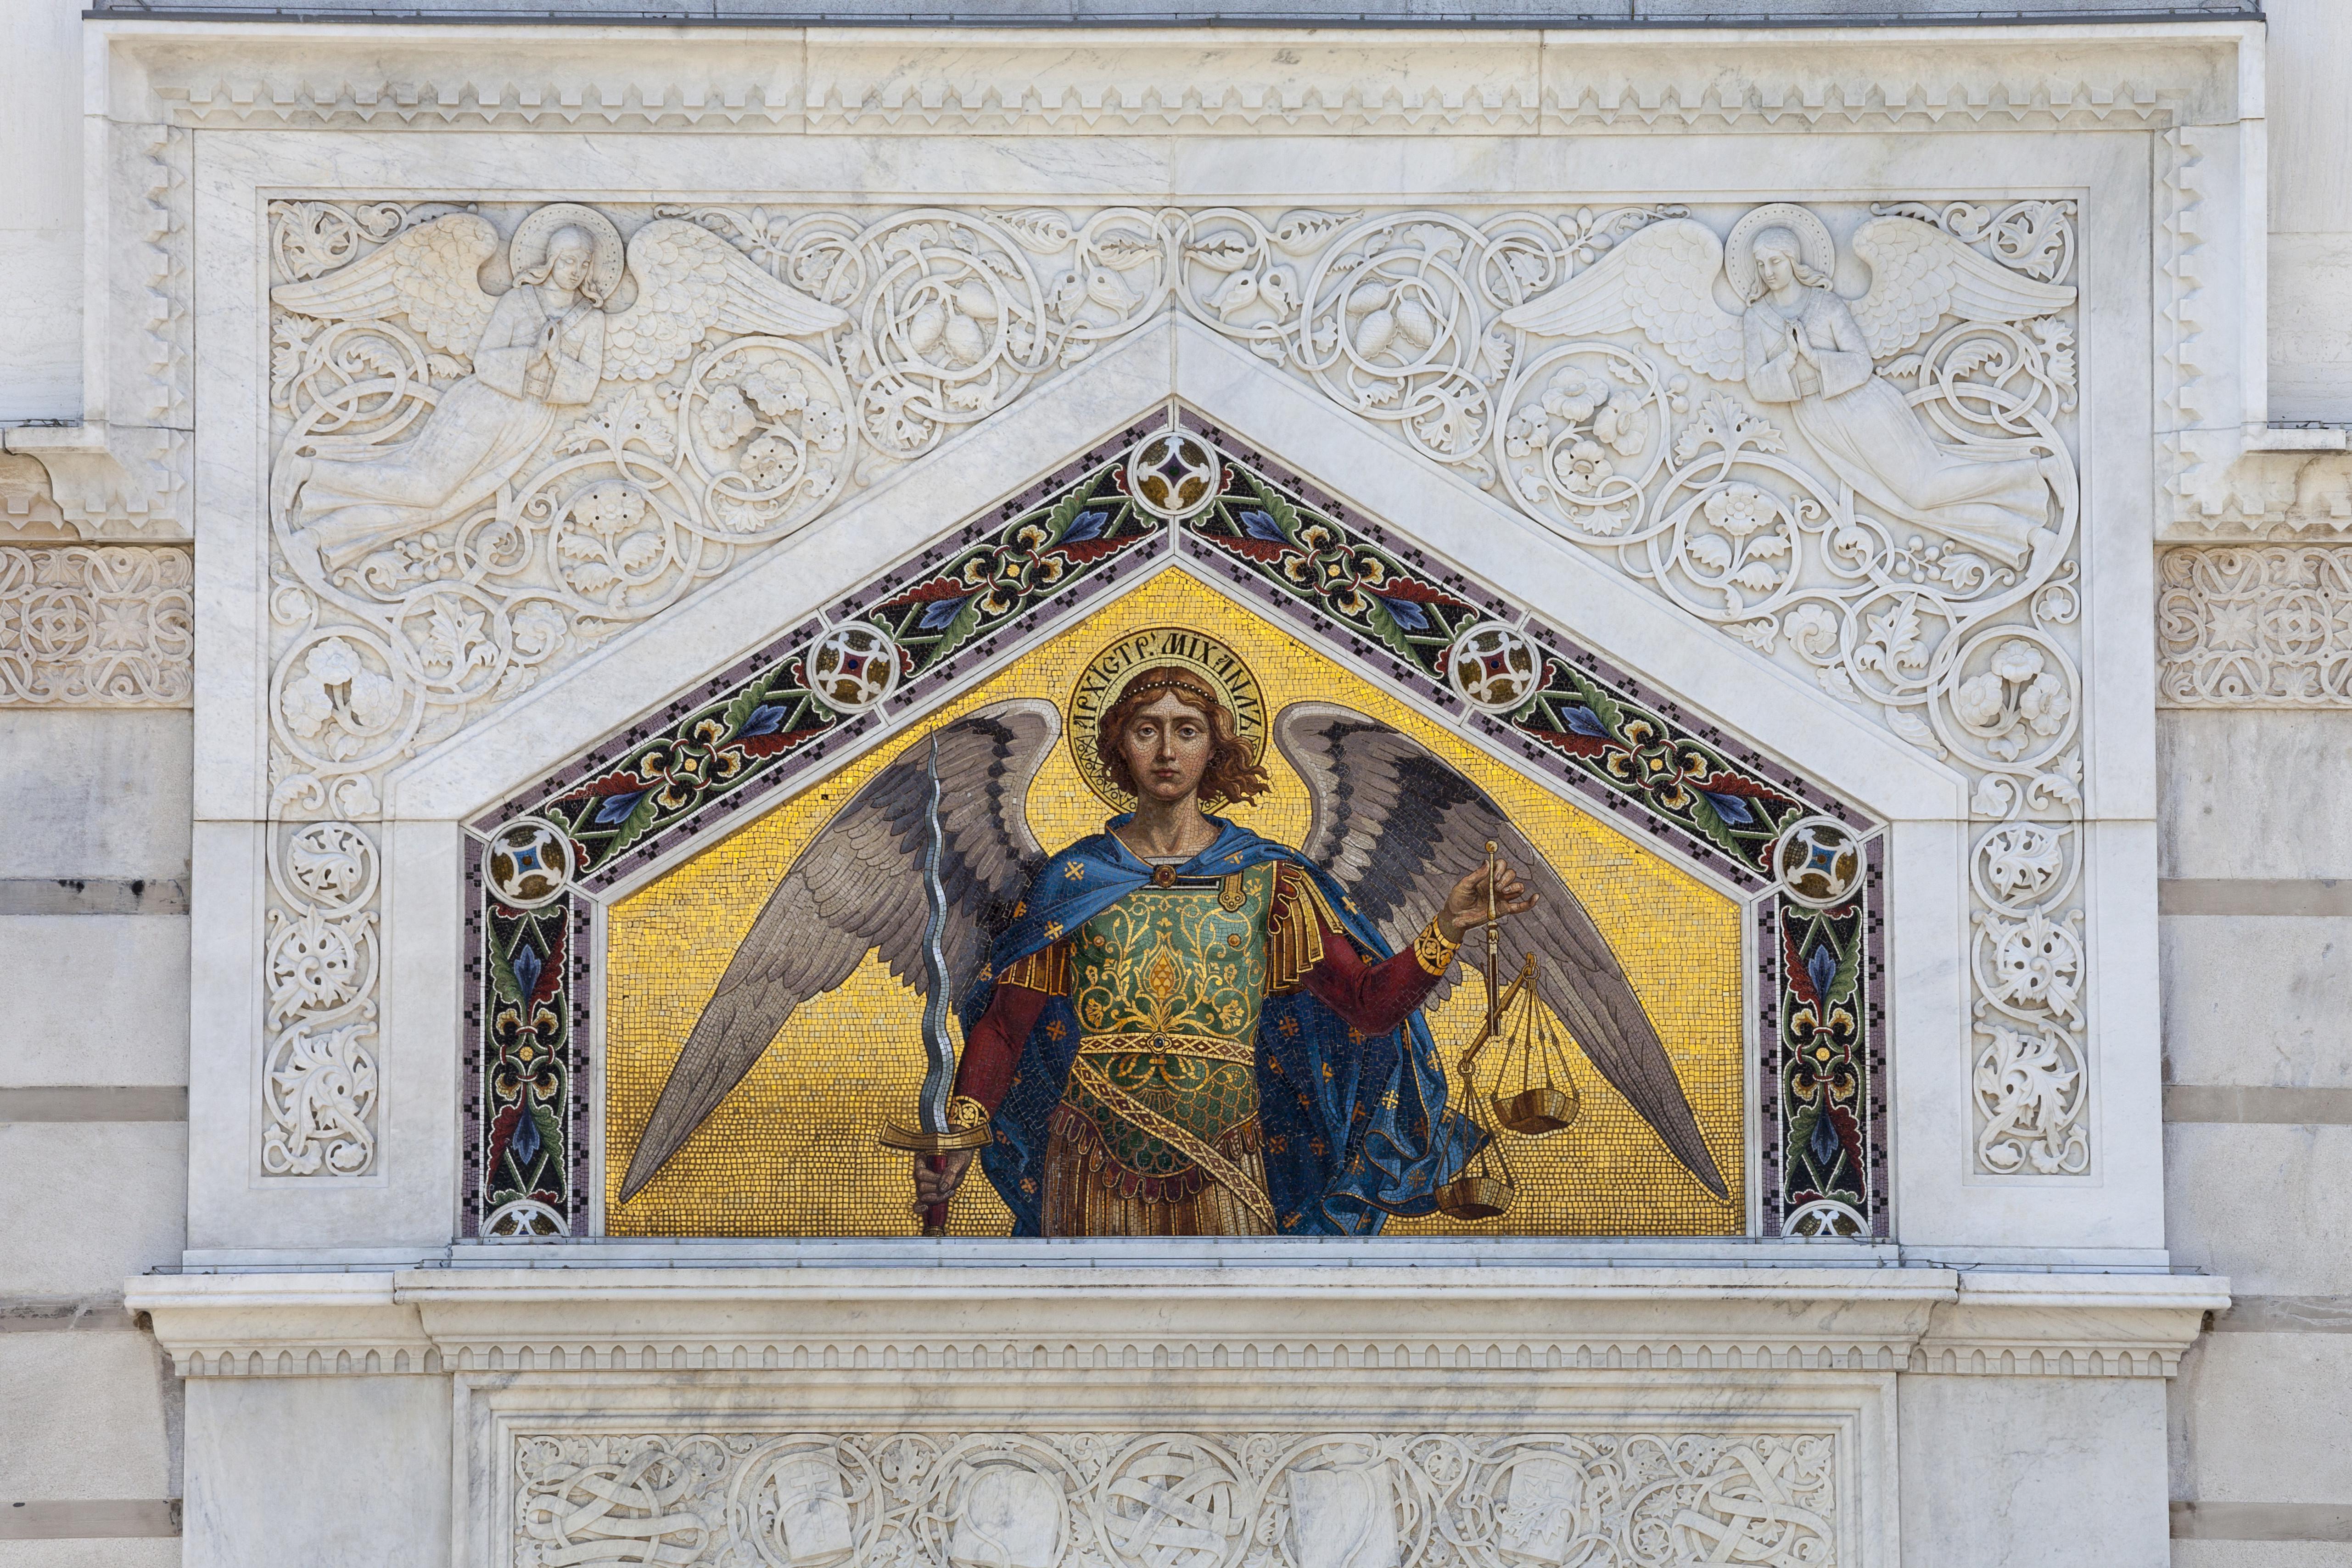 Mosaic on the facade, Serbian Orthodox church Saint Spyridon Church, Piazza Sant Antonio, Trieste, Friuli-Venezia Giulia, Italy